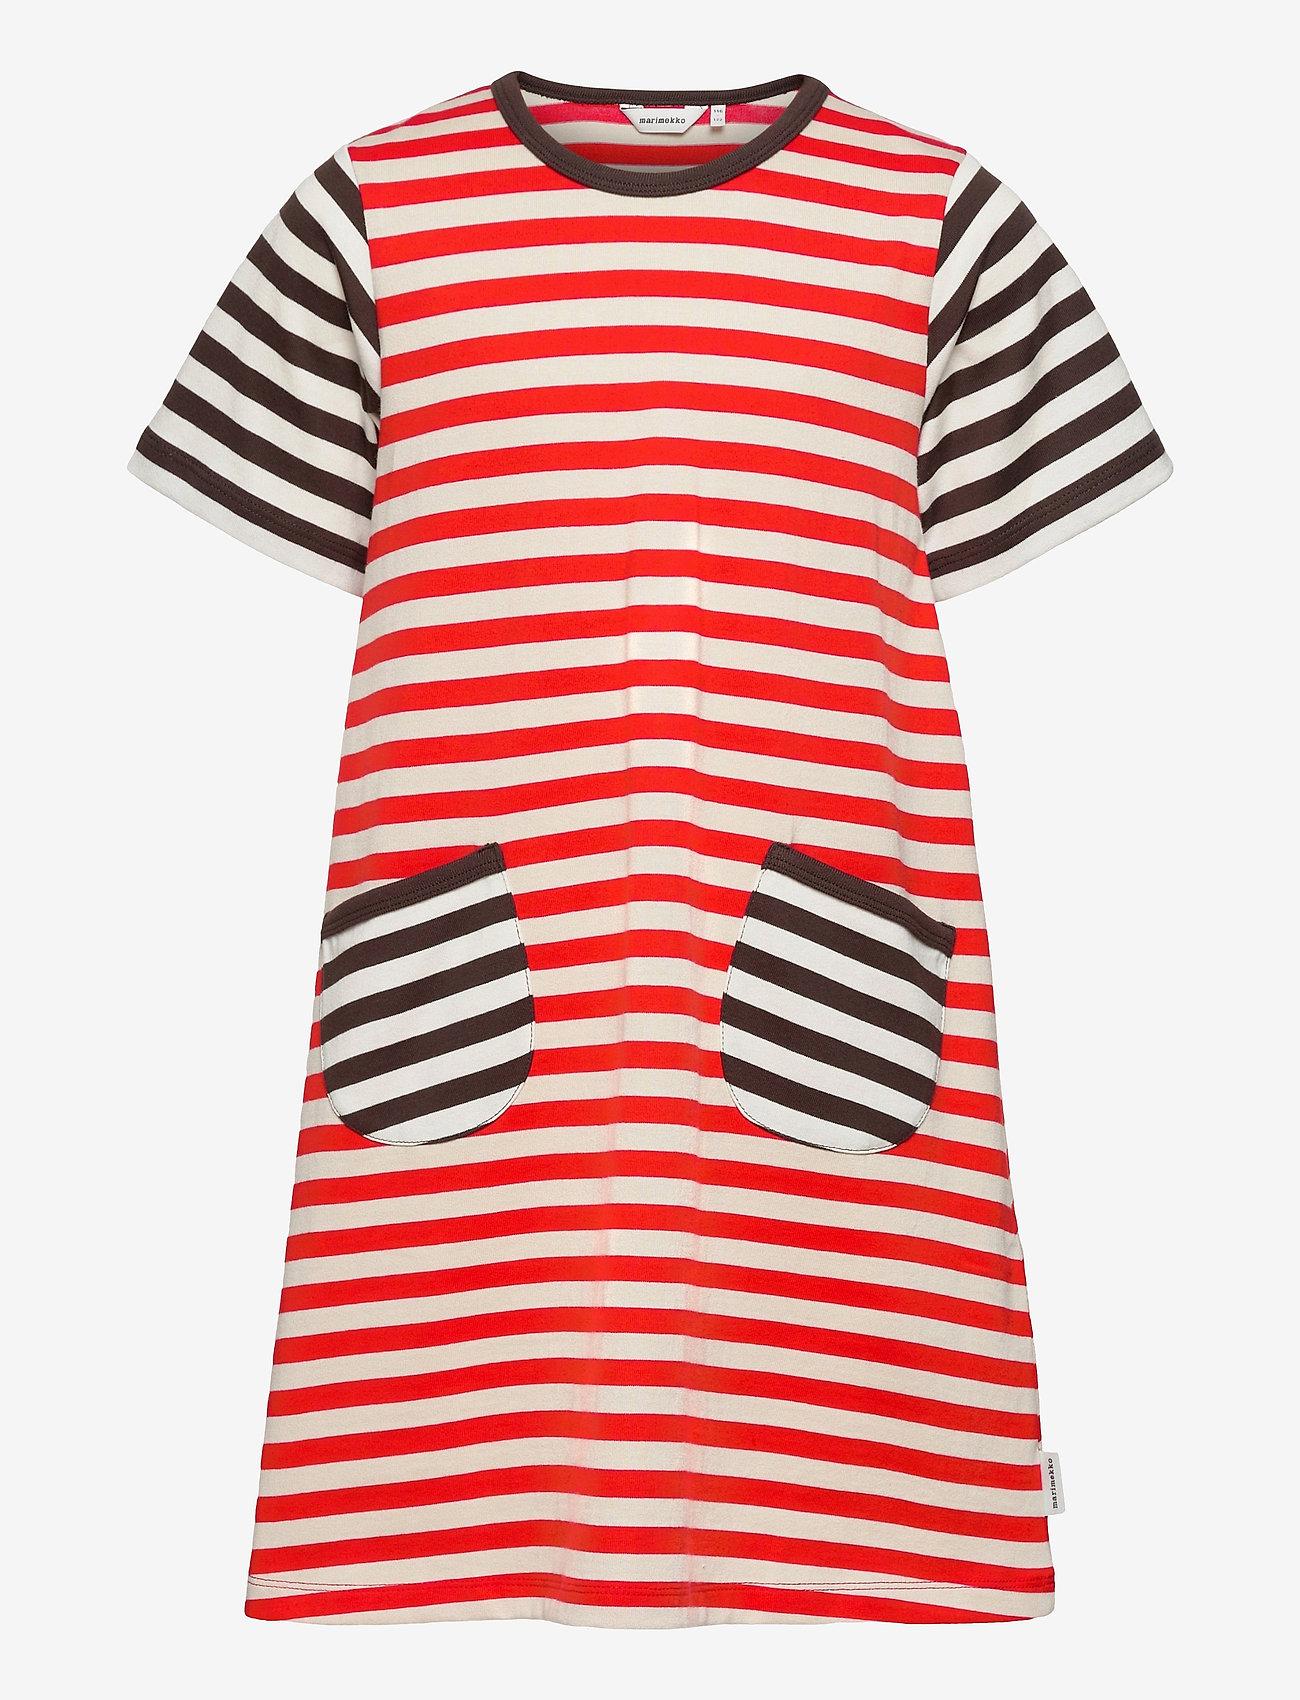 Marimekko - AHDE TASARAITA DRESS - sukienki - orange red, light beige - 0